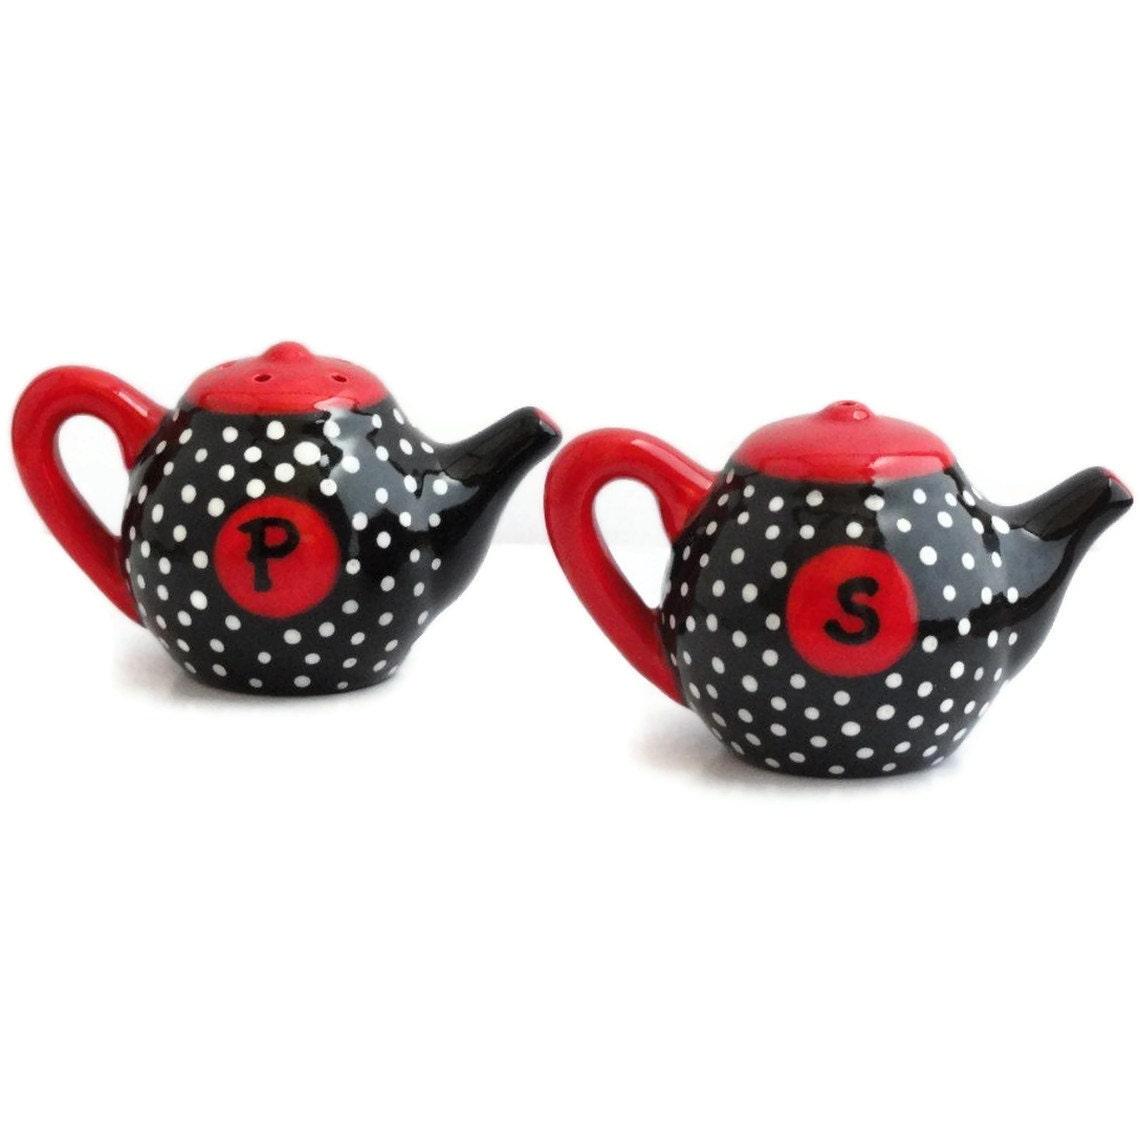 Items Similar To Ceramic Salt And Pepper Shakers Teapot